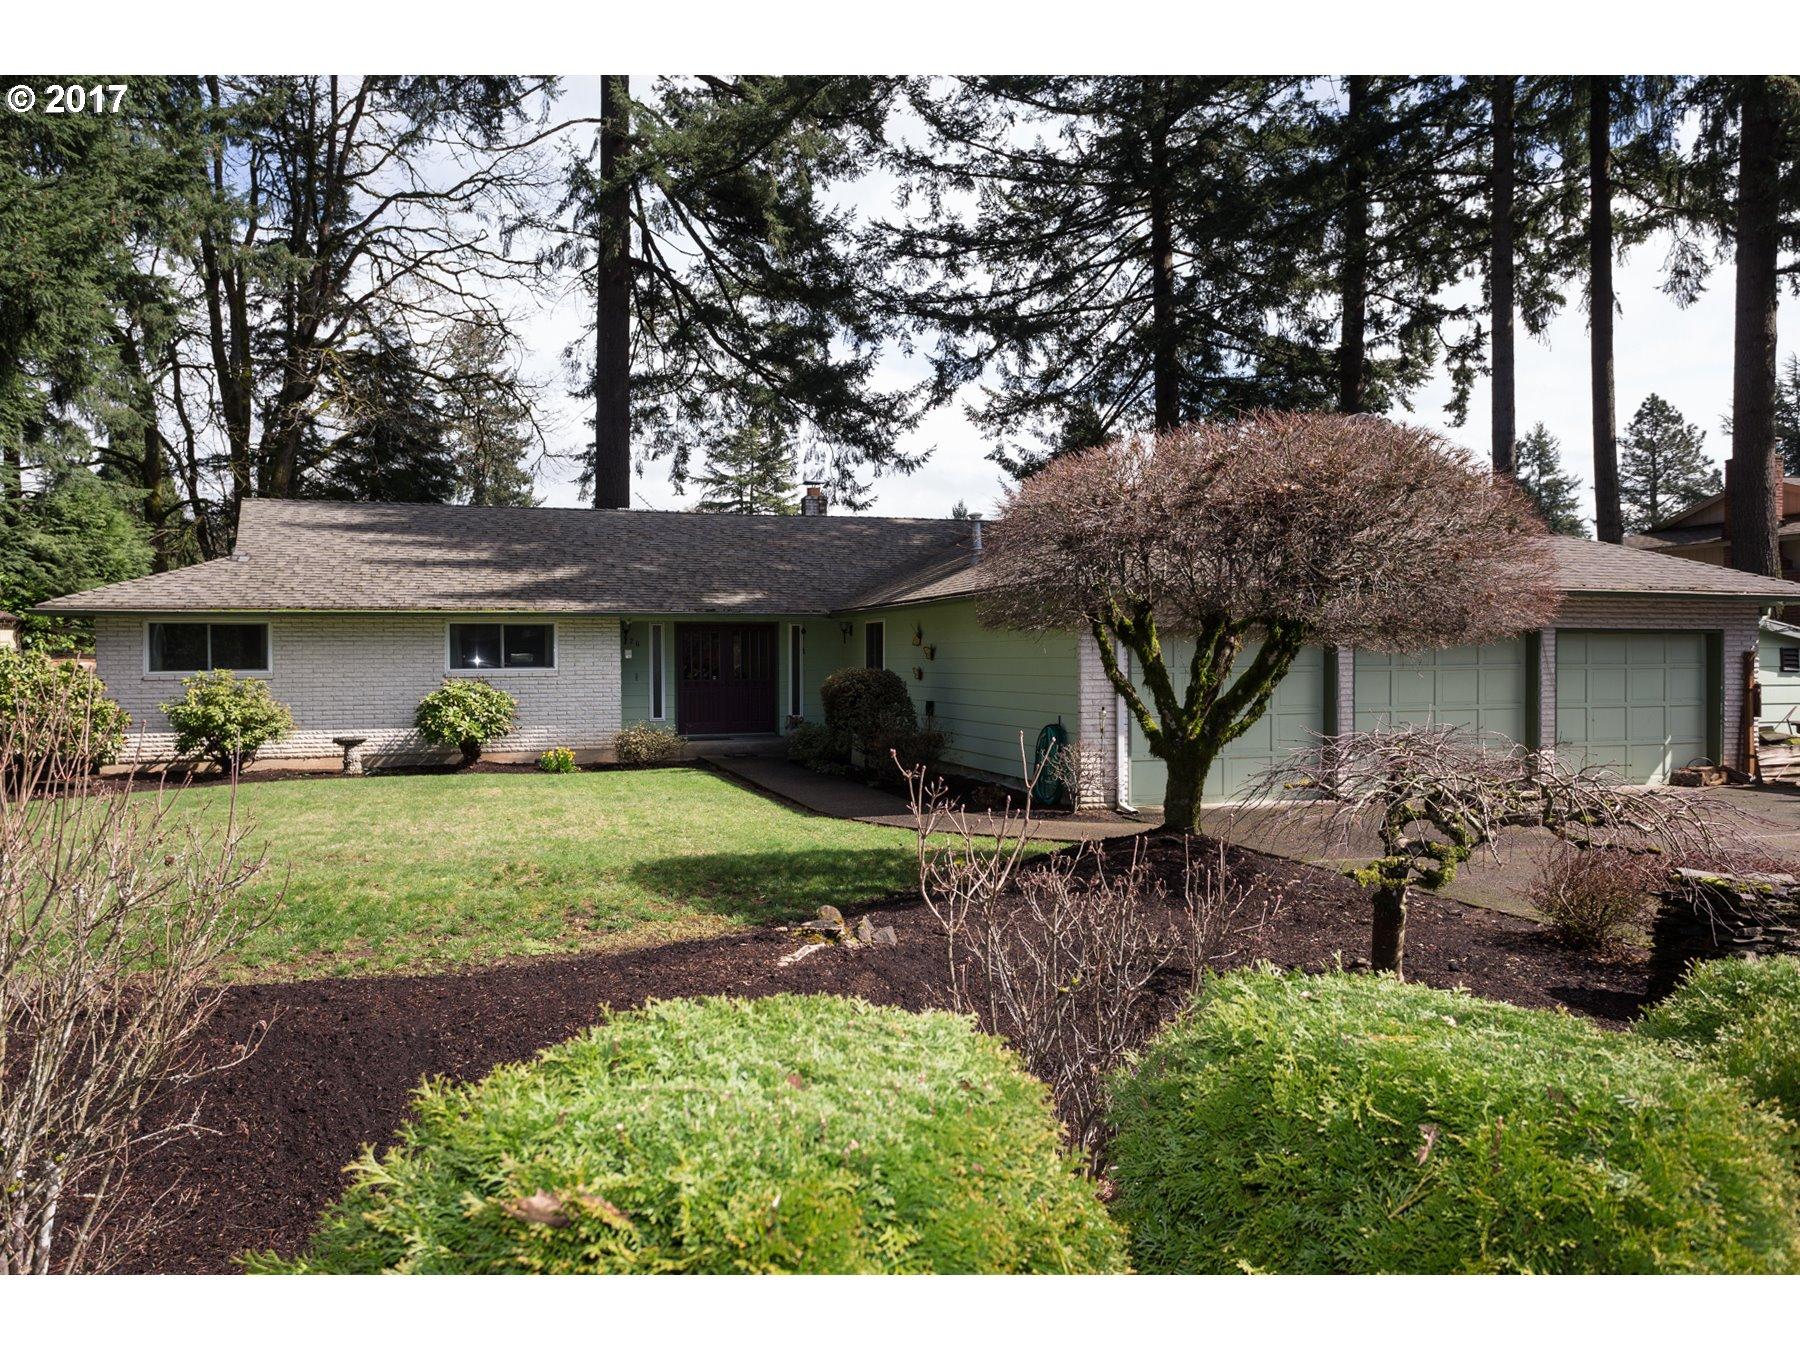 326 CHERRY AVE, Oregon City, OR 97045